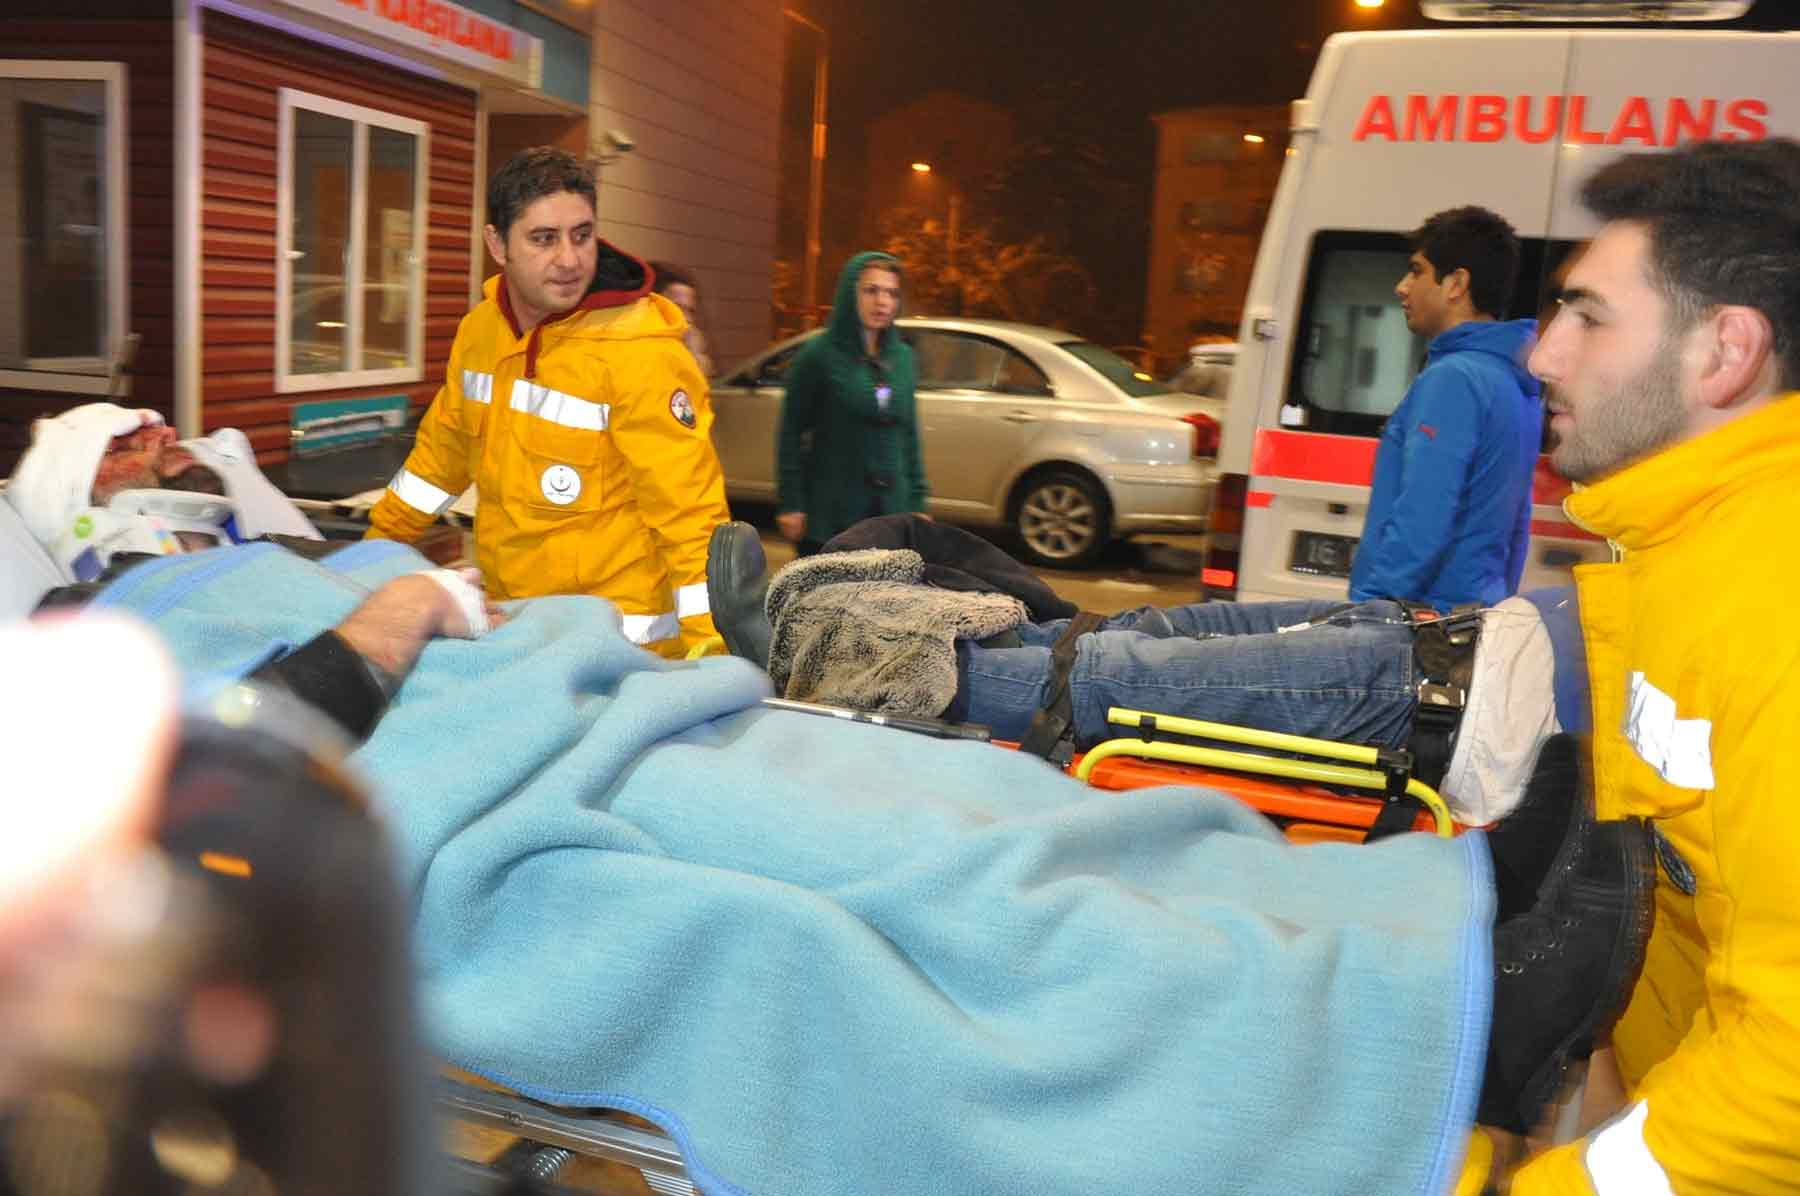 Bursa'da buzlanma kaza getirdi 11